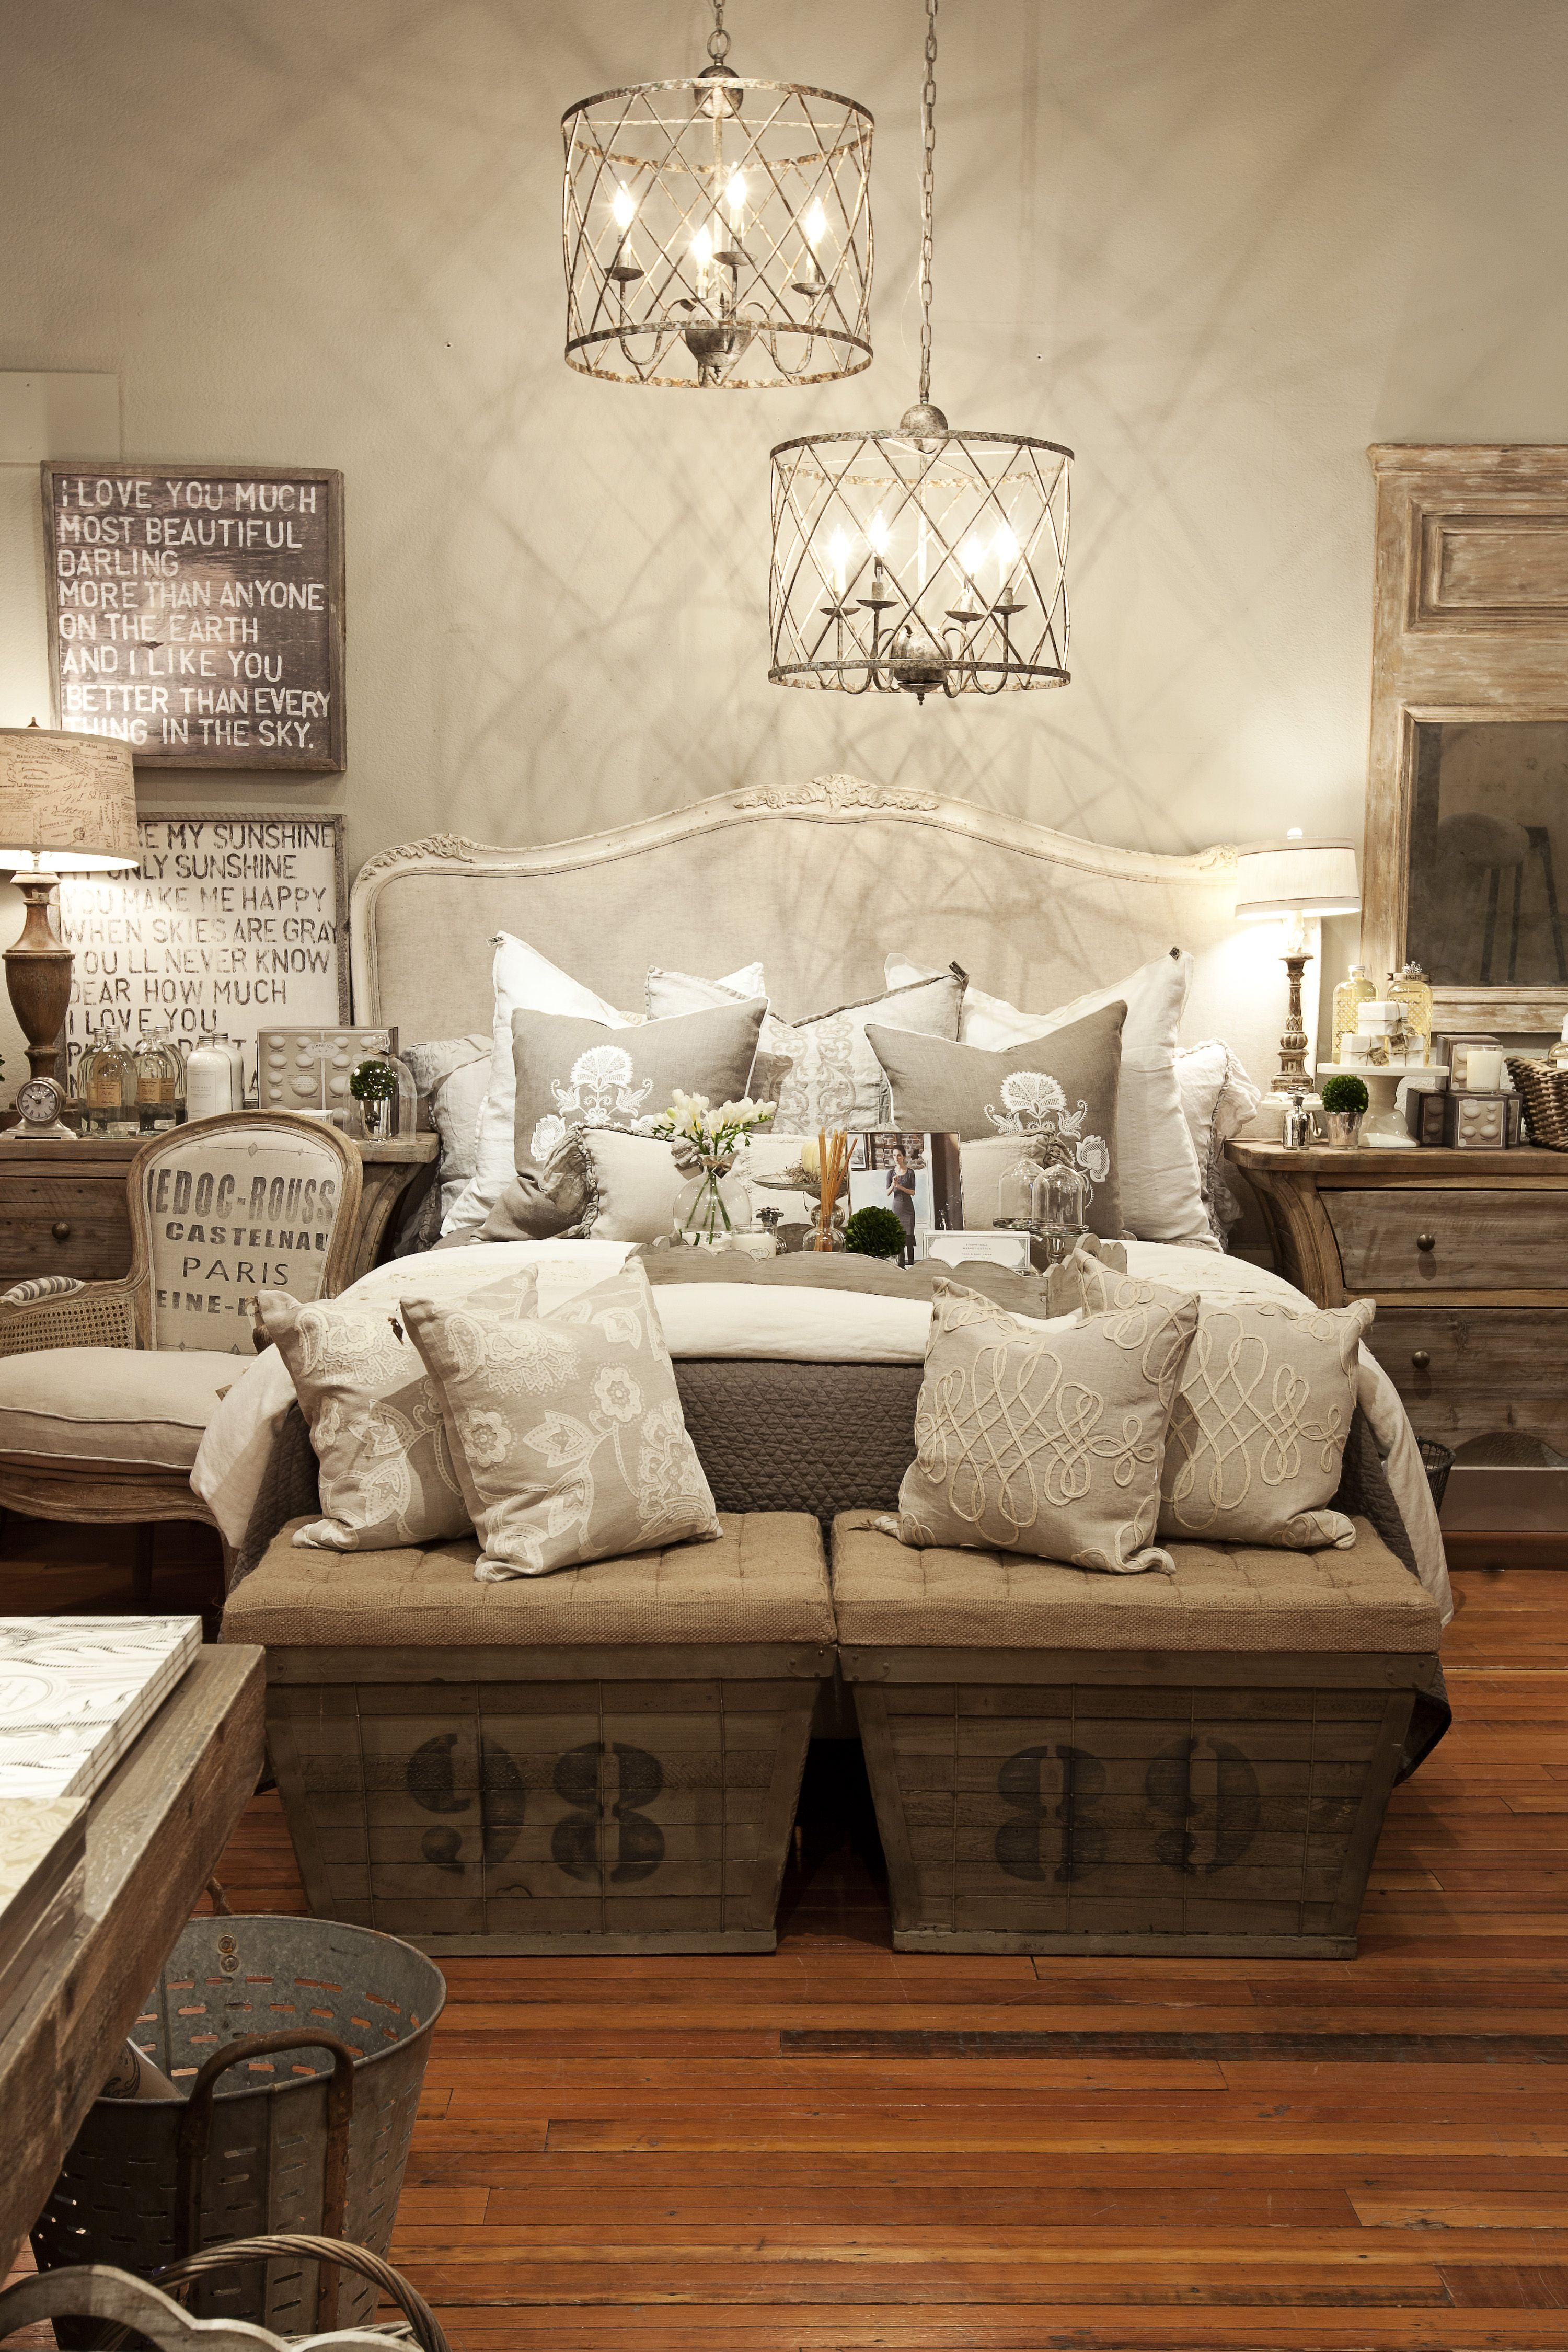 Sweet dream room.